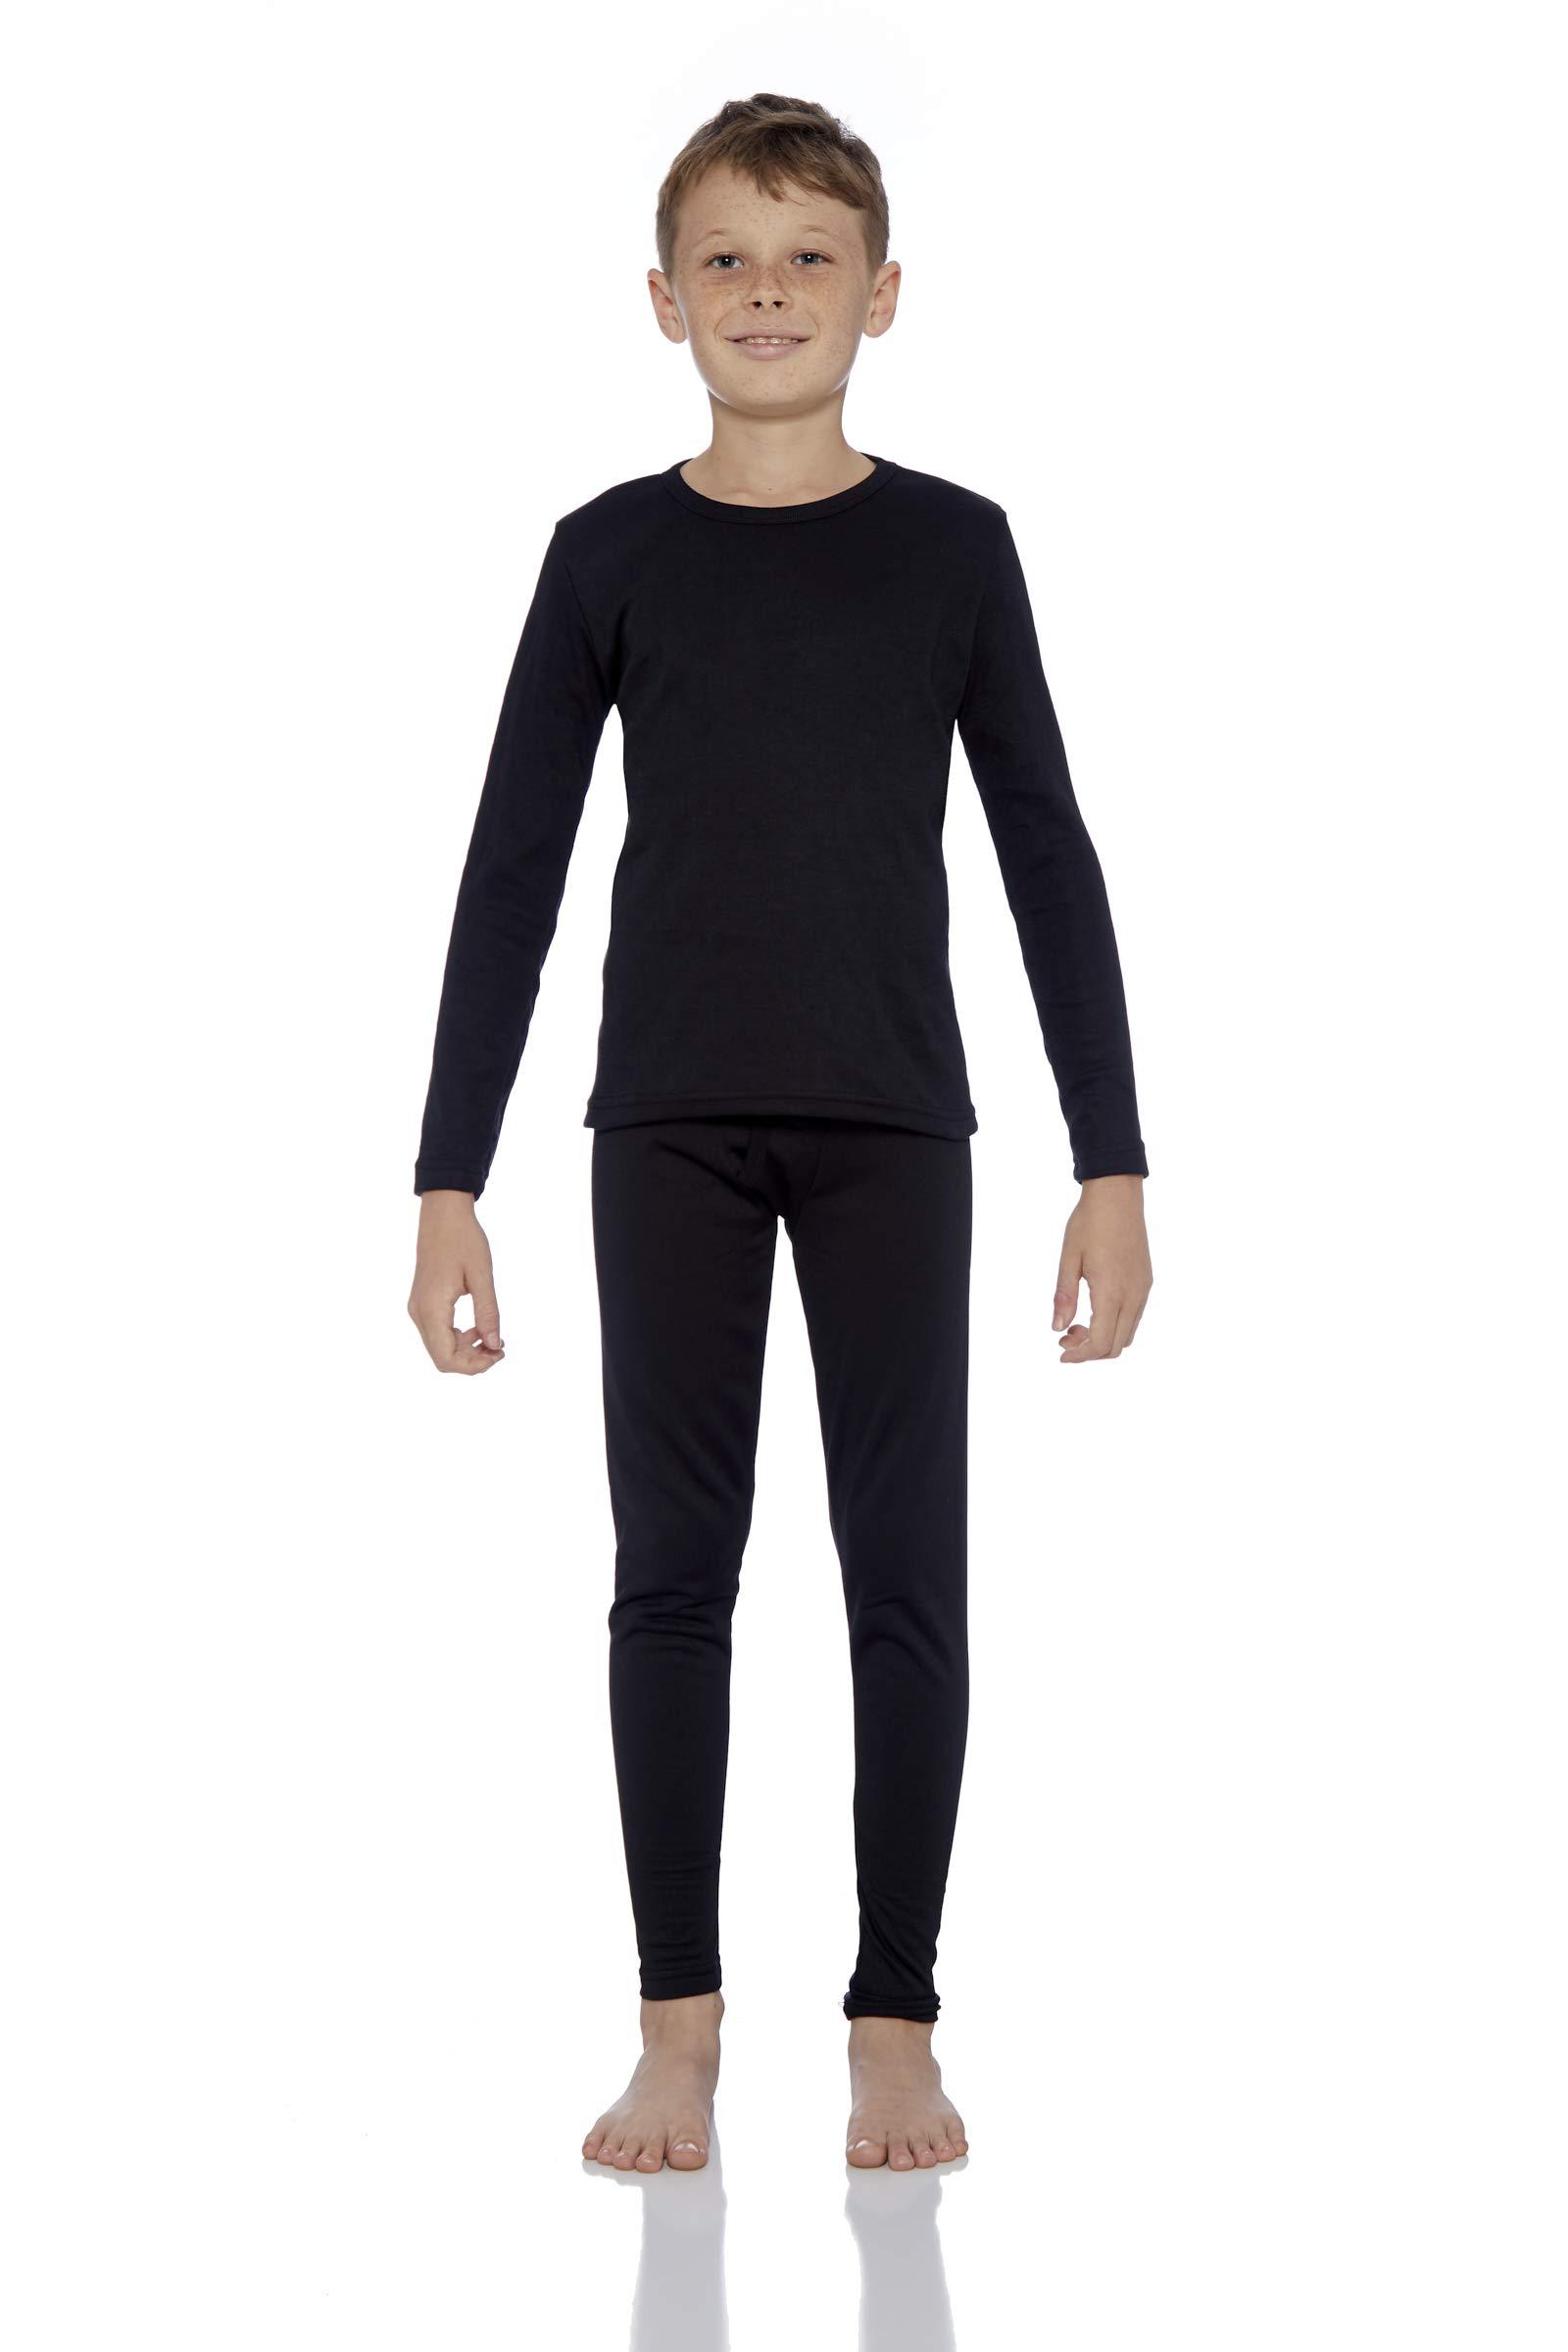 Rocky Boy's Fleece Lined Thermal Underwear 2PC Set Long John Top and Bottom (L, Black)